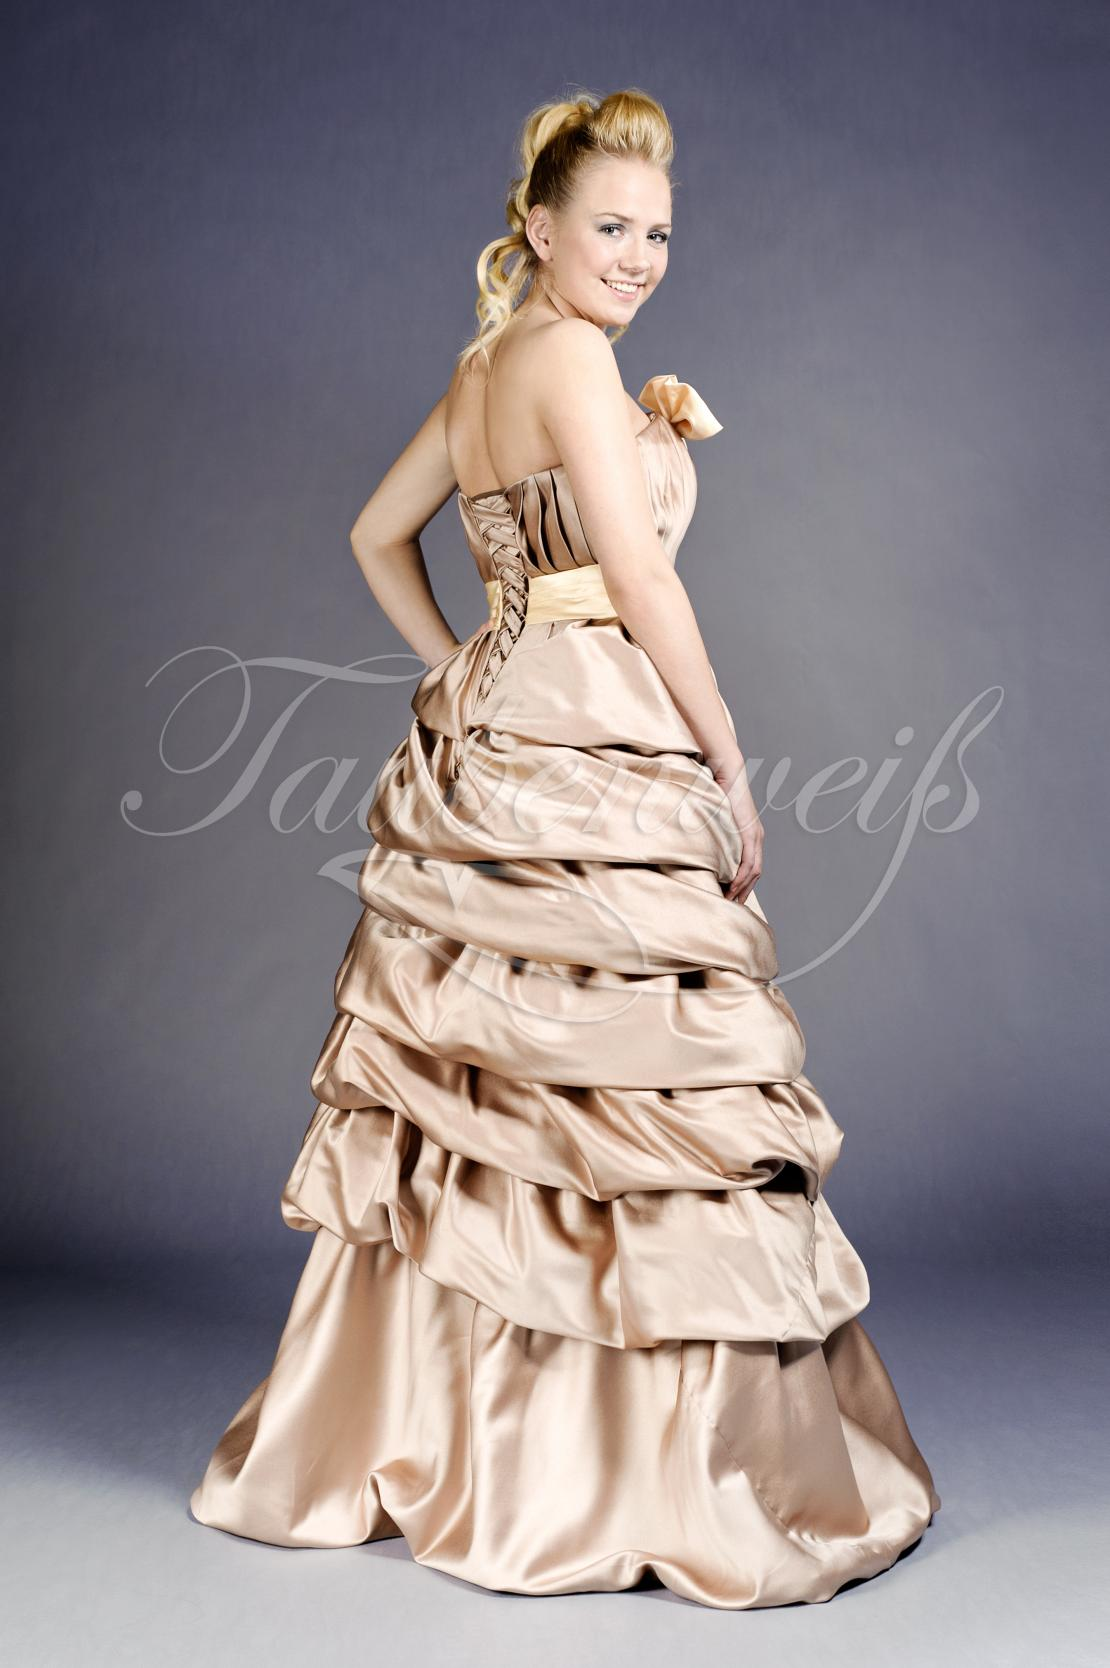 Abendkleid TW12A - Abendkleid Satin braun chocolat gerafft lang trägerlos